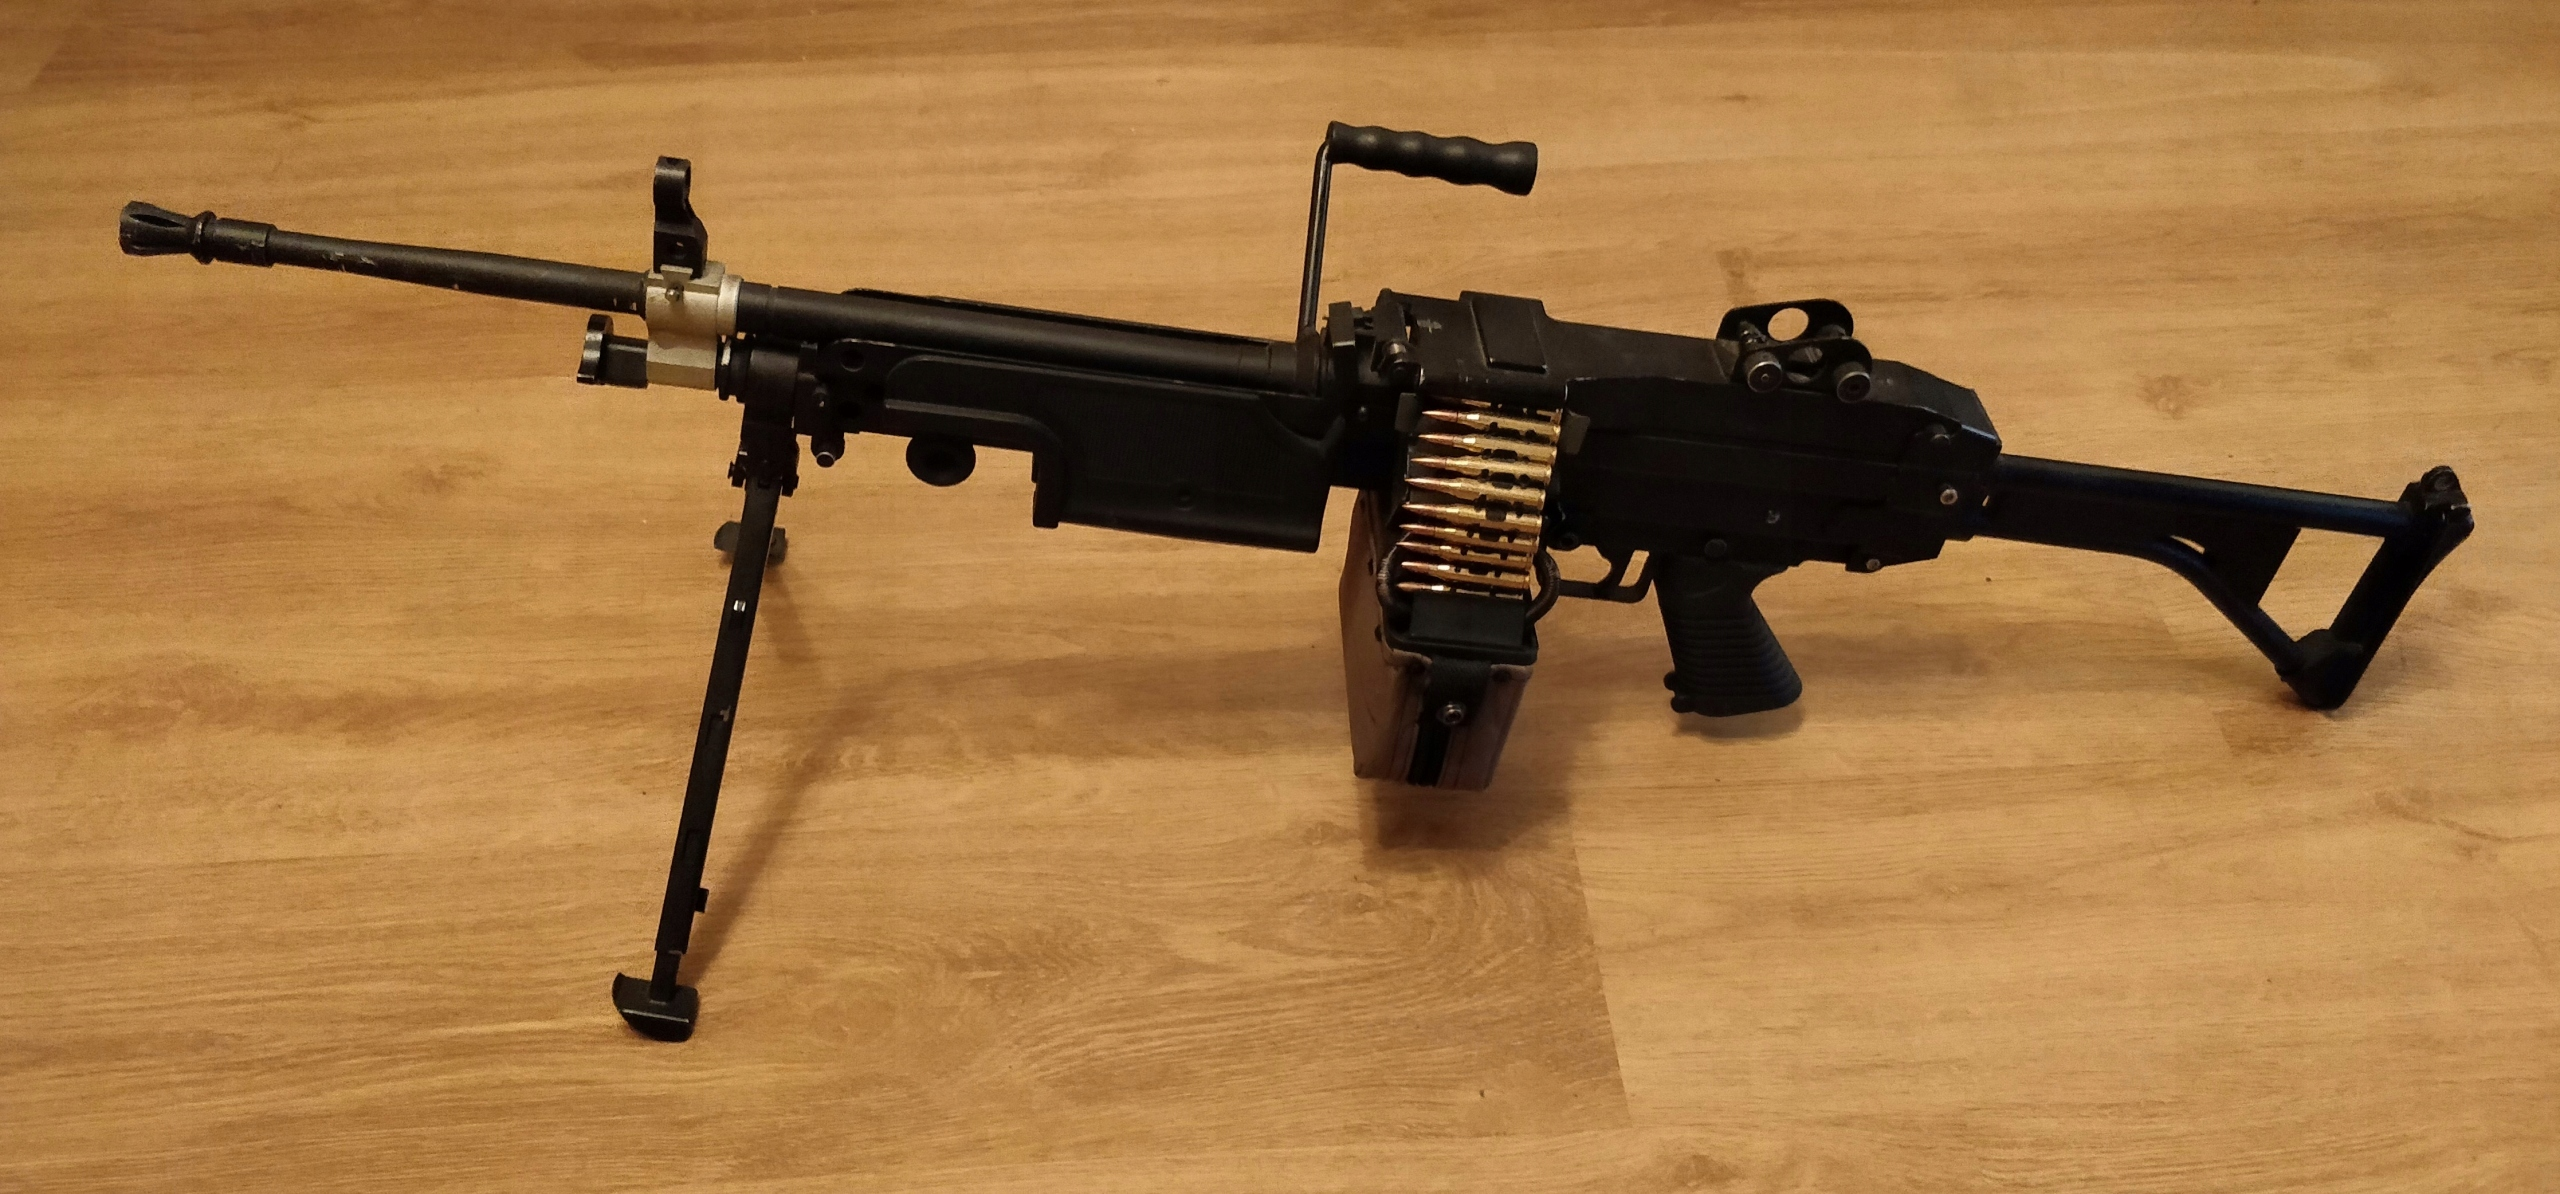 [A&K] M249 - tuning AirsoftPro, Guarder